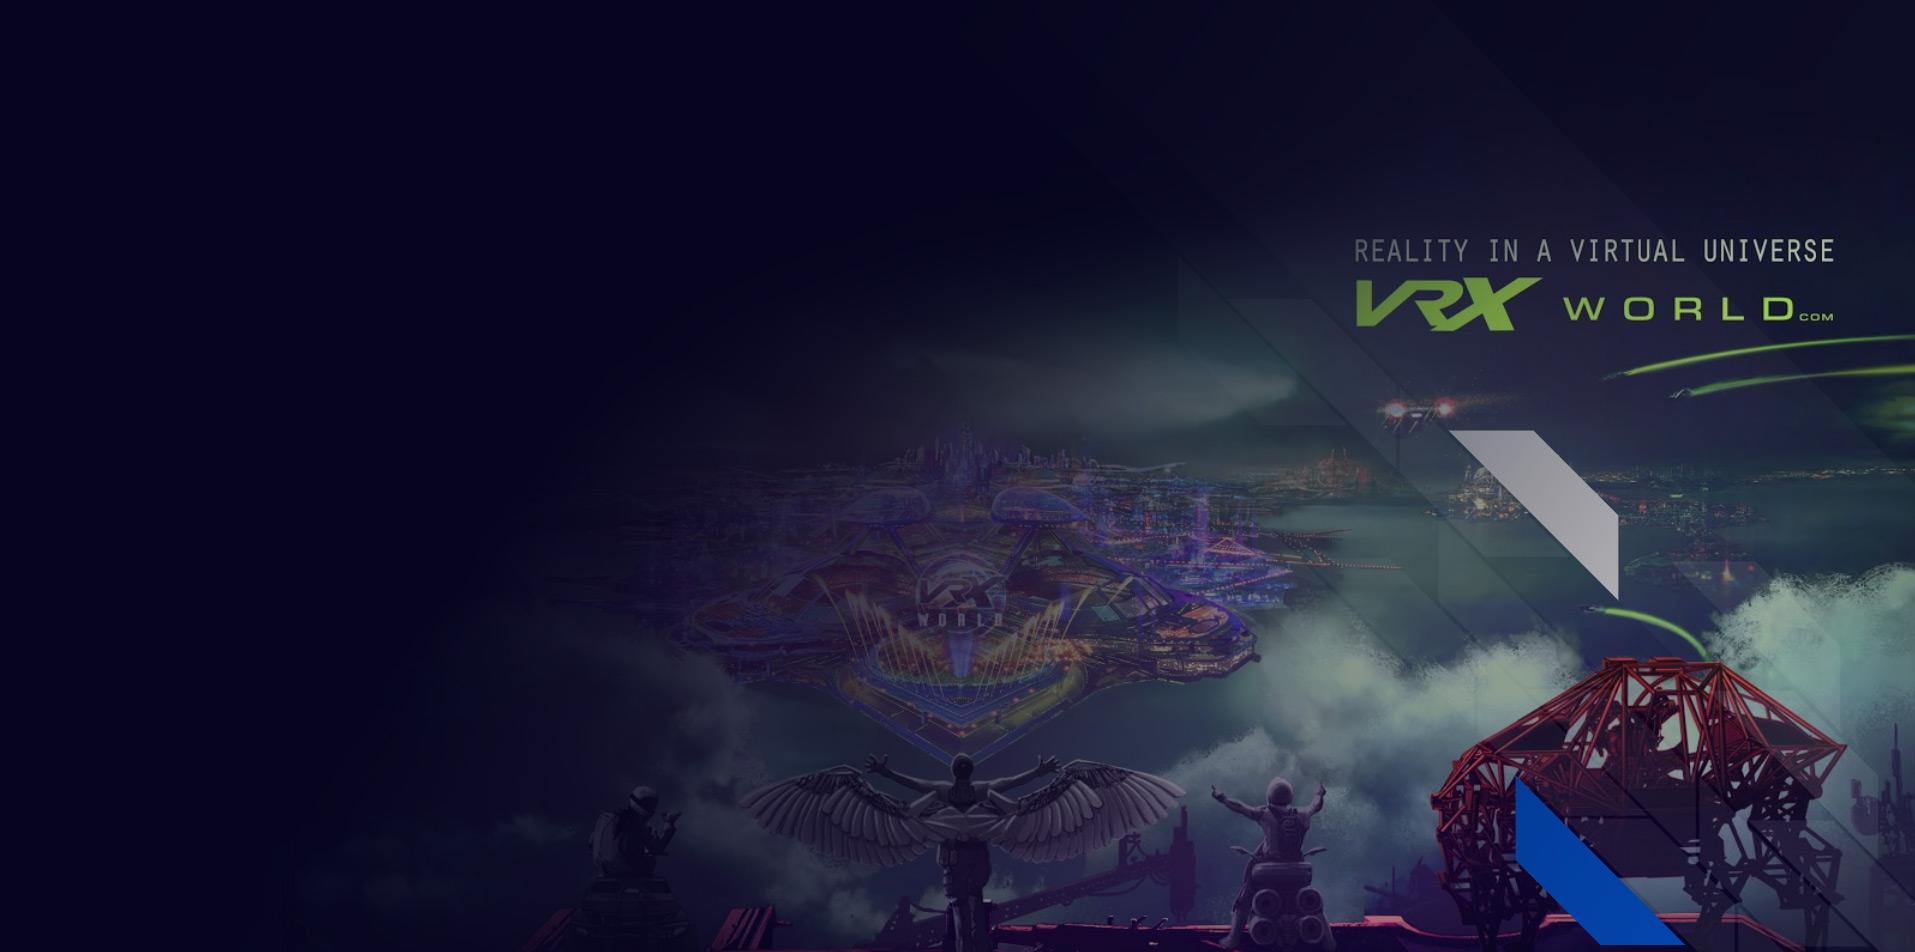 vrx world concept